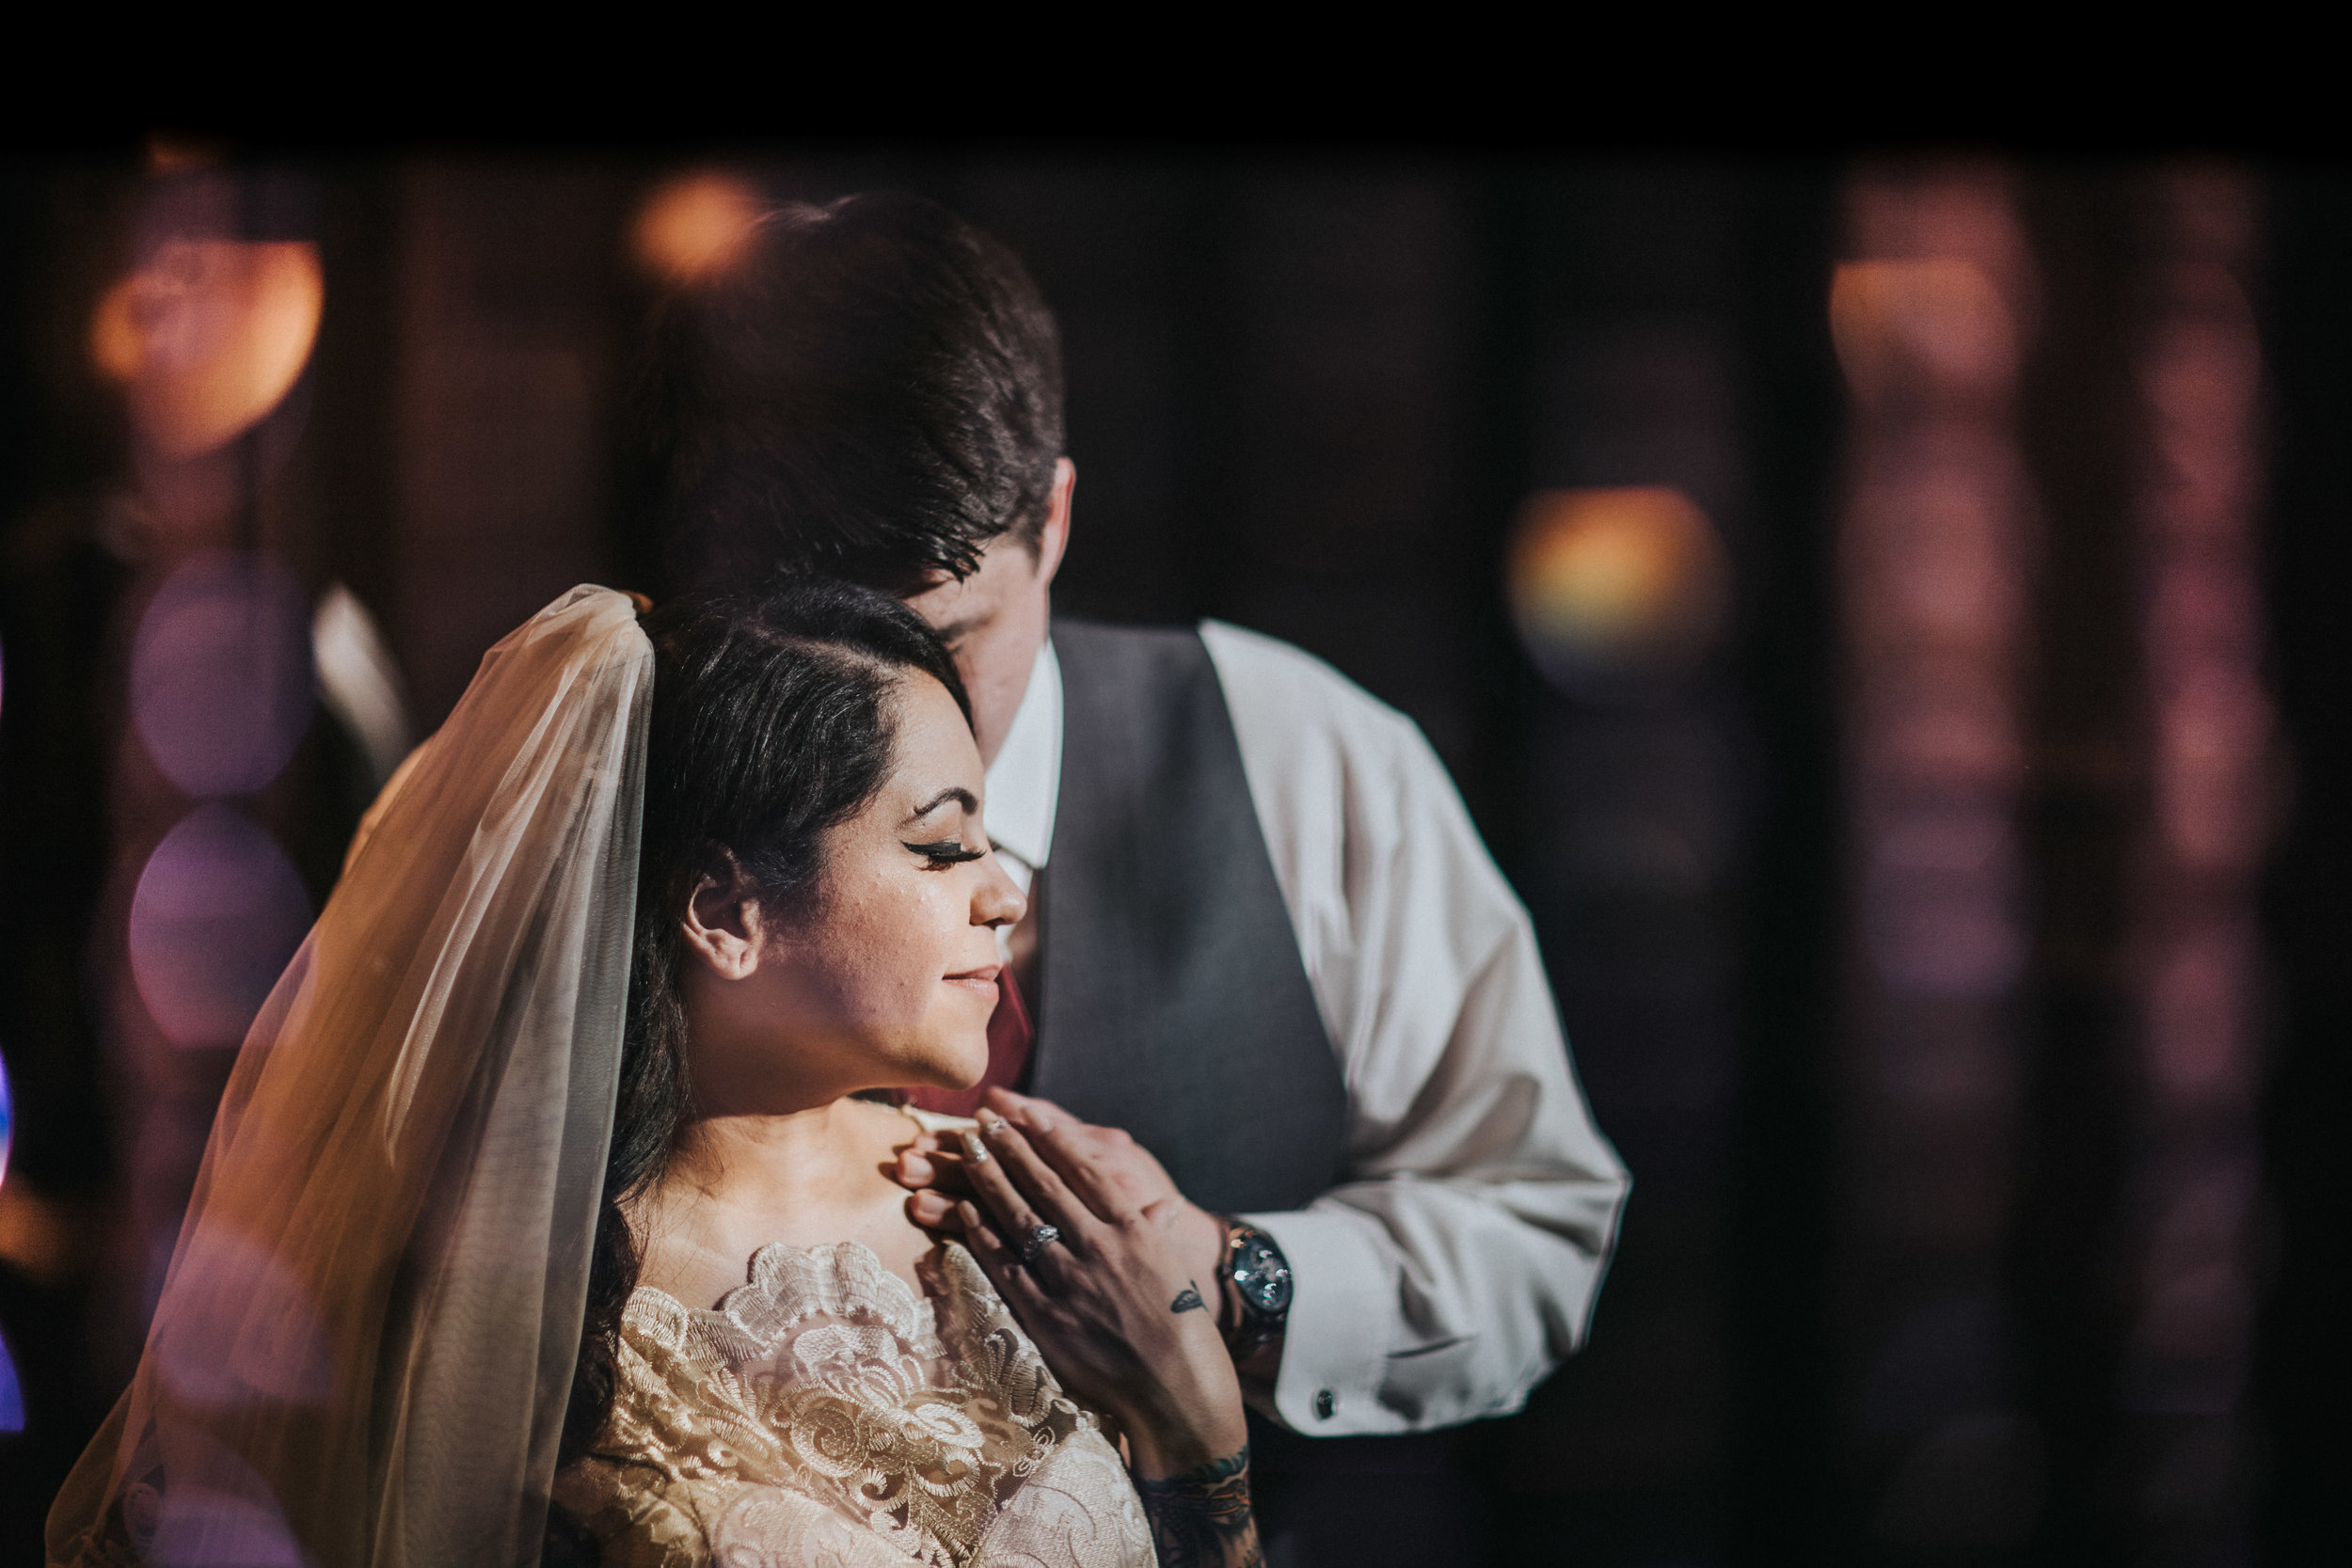 New-Jersey-Wedding-Photographer-ReceptionCenter-Valeria&Mike-First-Look-Bride&Groom (78 of 2).jpg